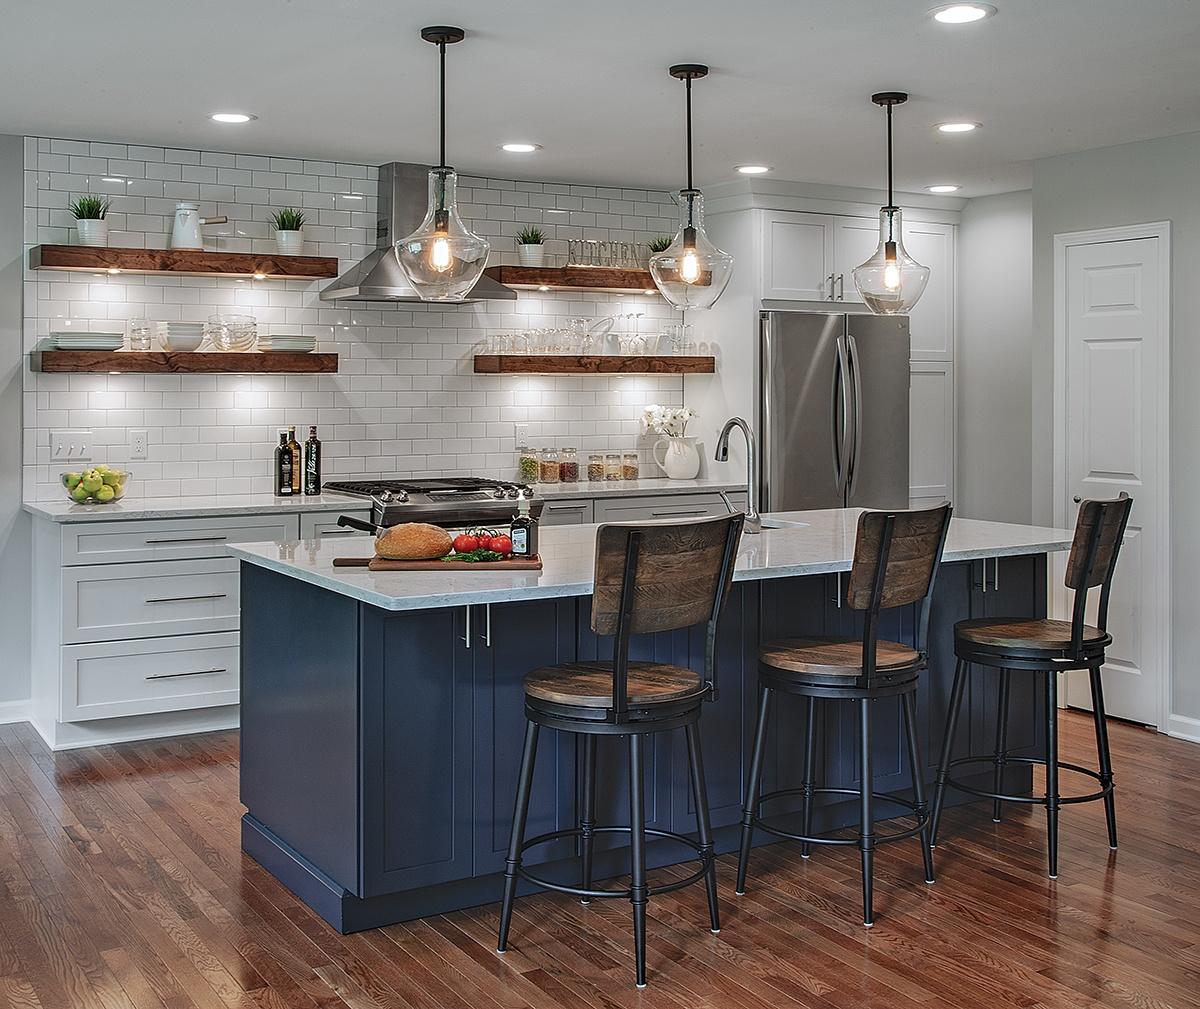 Merillat-White-Navy-Kitchen-Design-Masterpiece-Maple-KSI